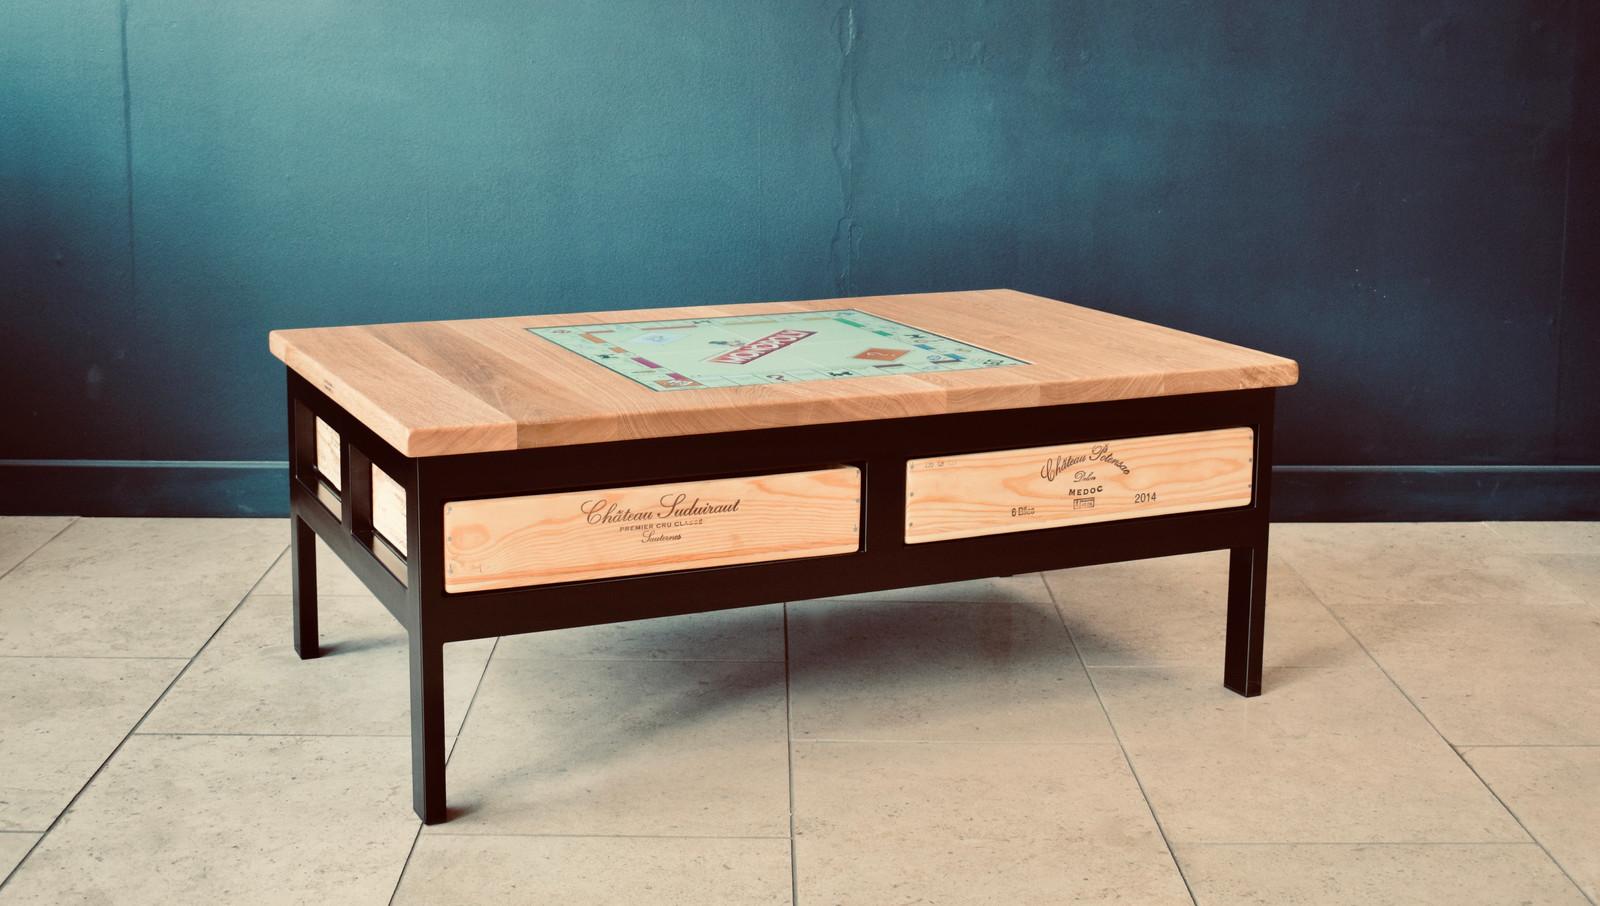 Bespoke Furniture For Wine Lovers The Wine Barrel